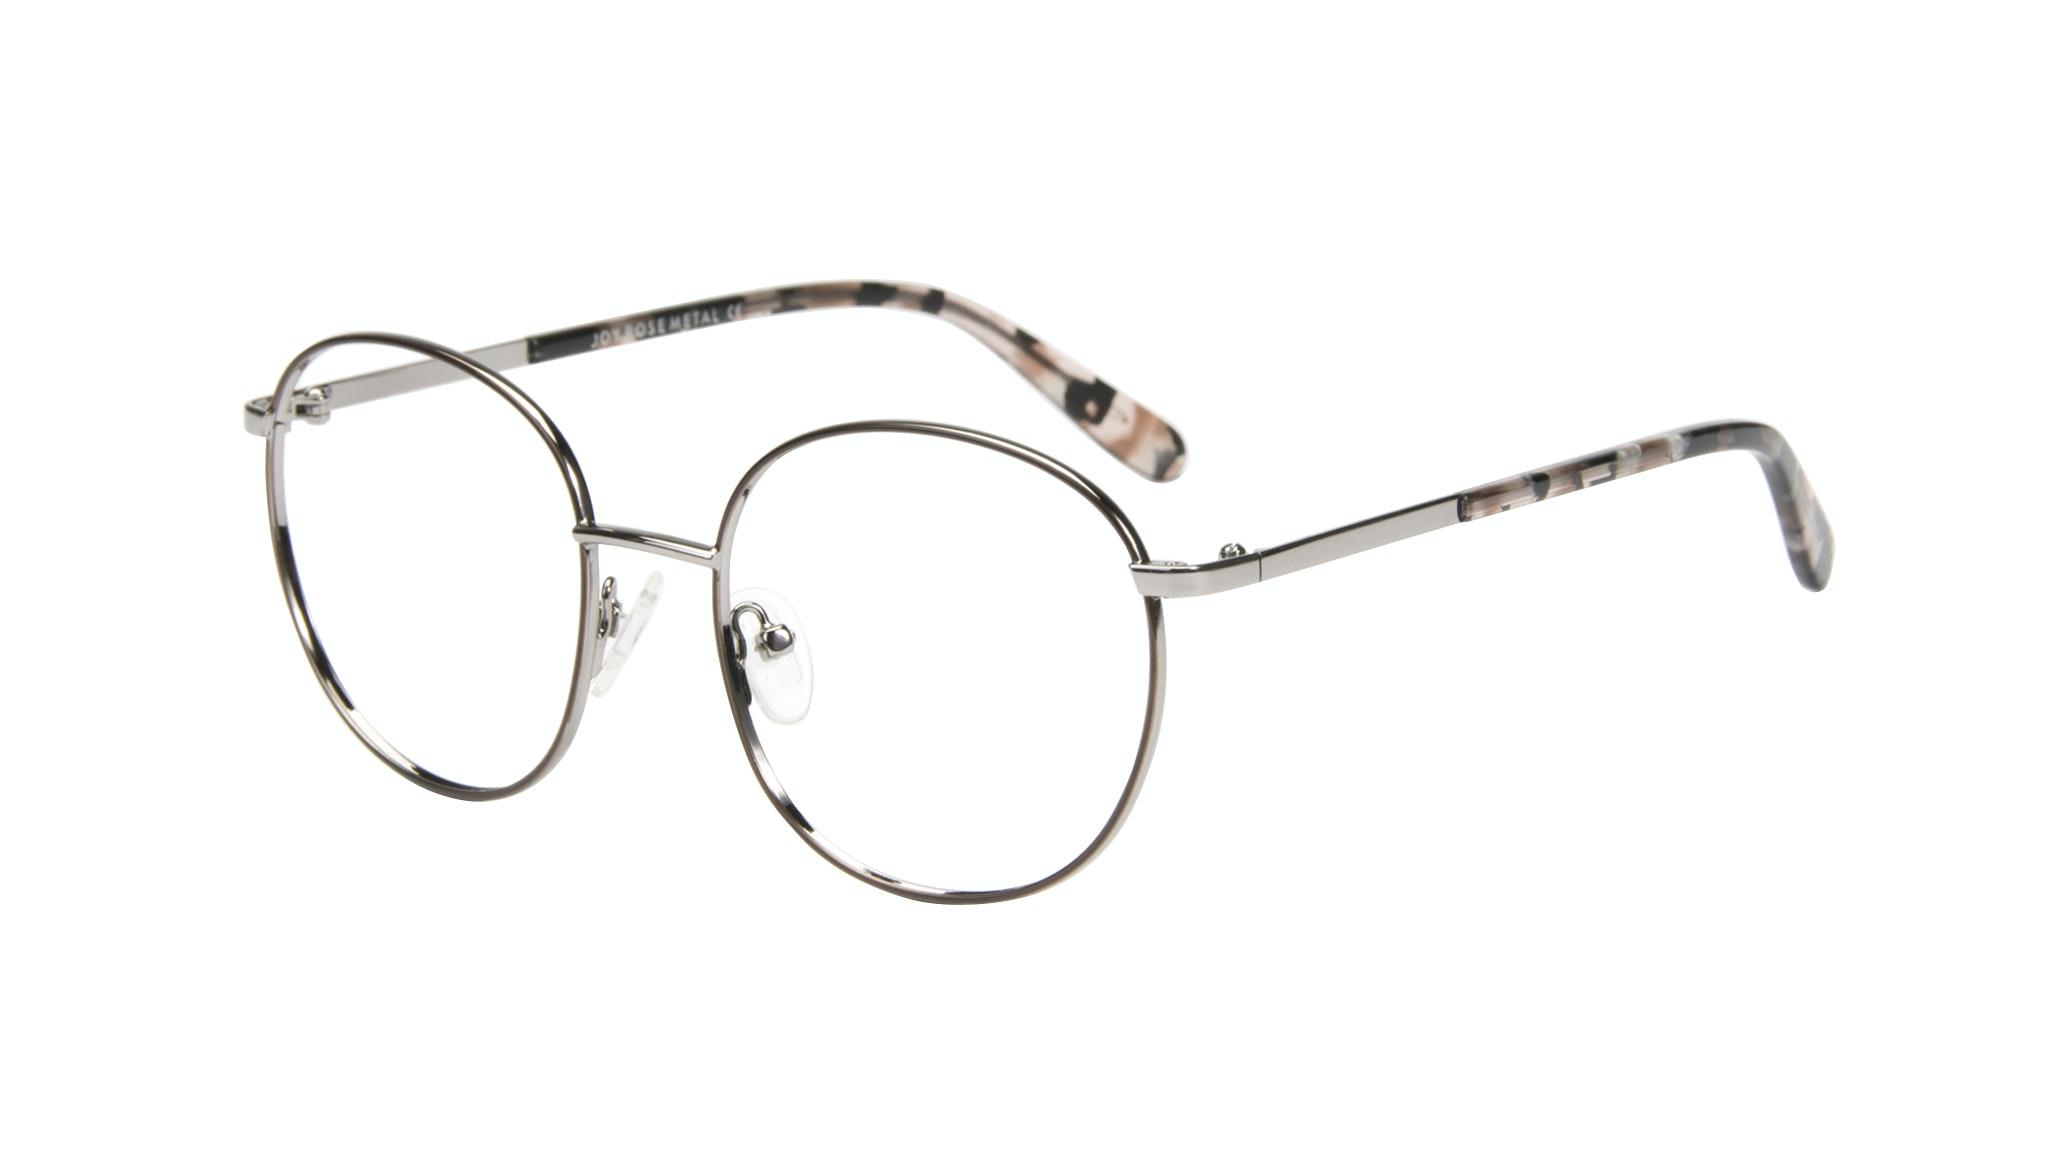 Affordable Fashion Glasses Round Eyeglasses Women Joy Rose Metal Tilt